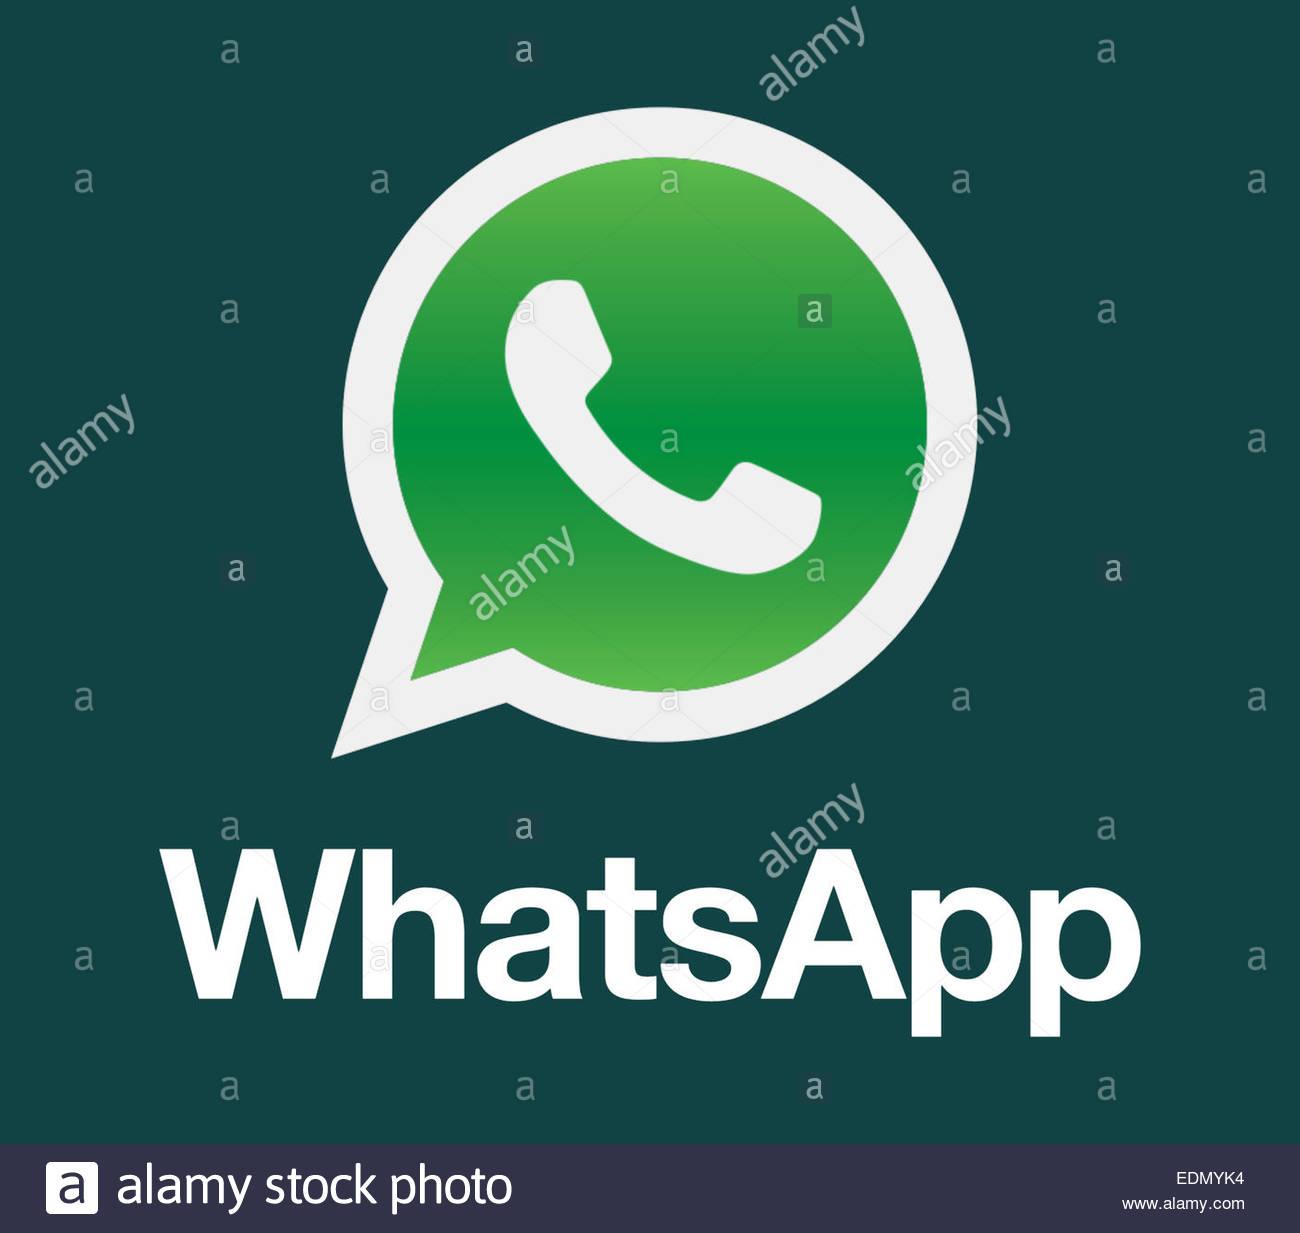 WhatsApp Logo Symbol Zeichen Stockfoto, Bild: 26 - Alamy